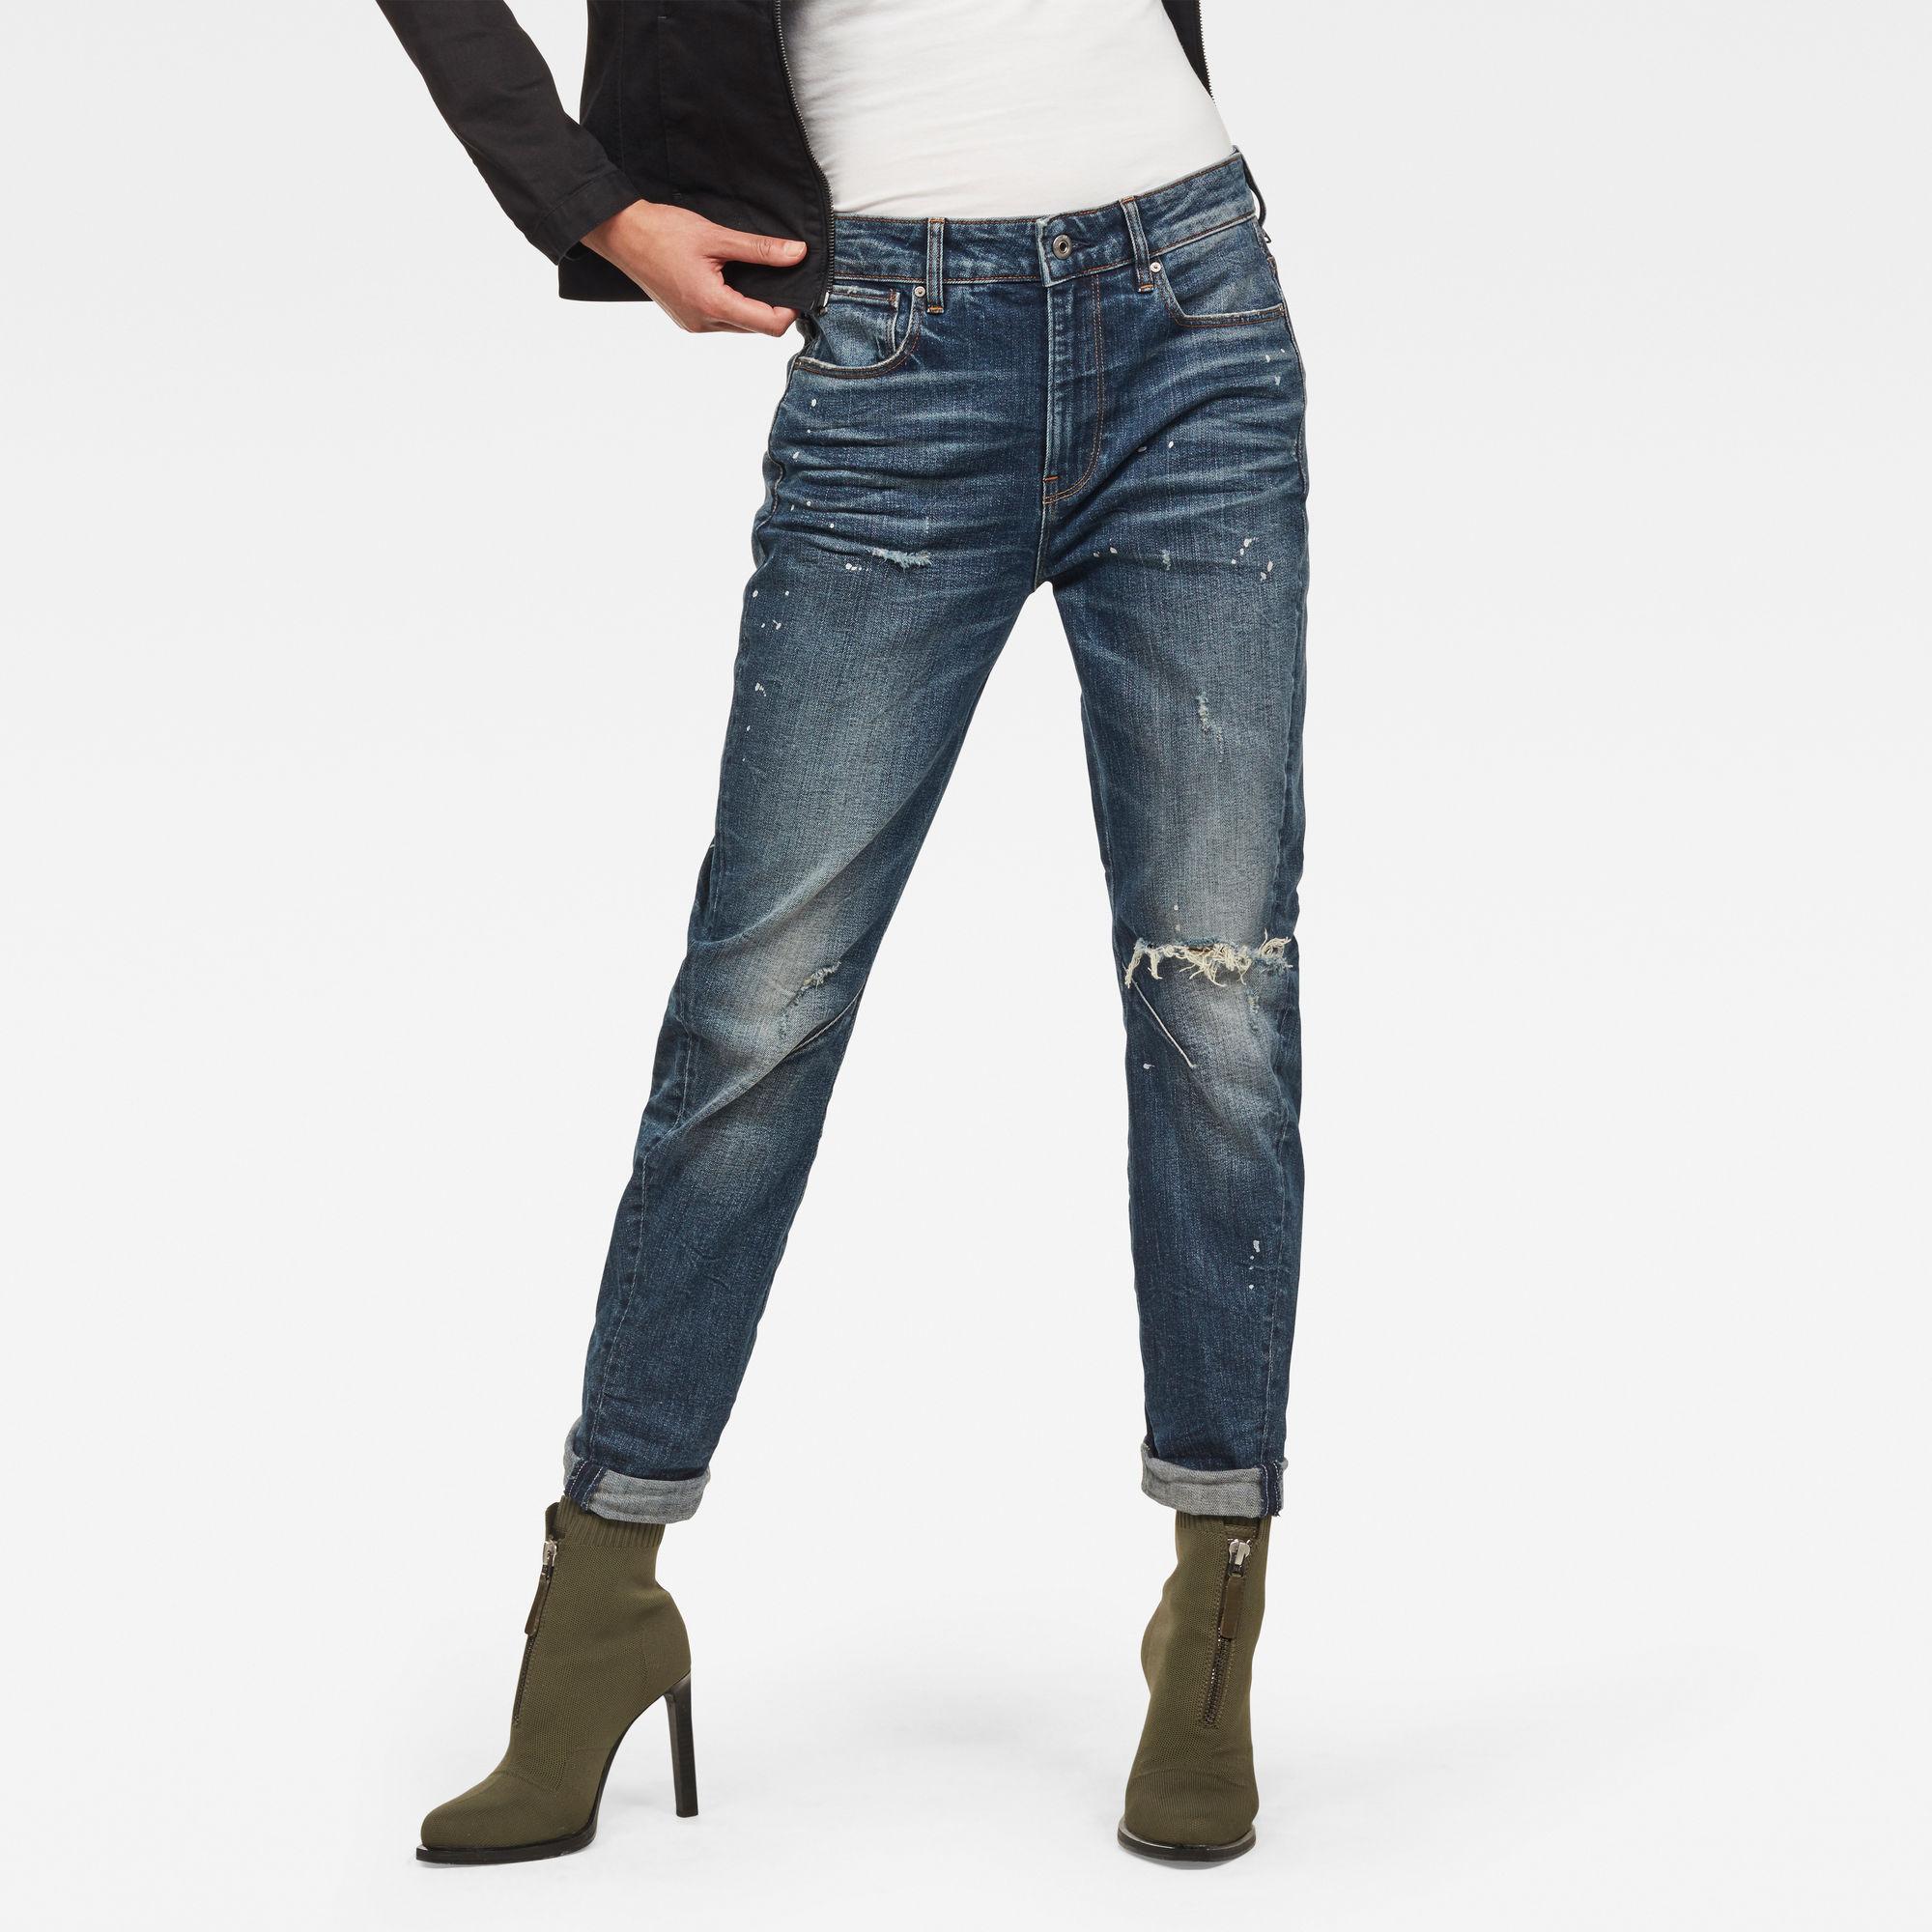 Image of G Star Raw Arc 2.0 3D Mid Waist Boyfriend Jeans